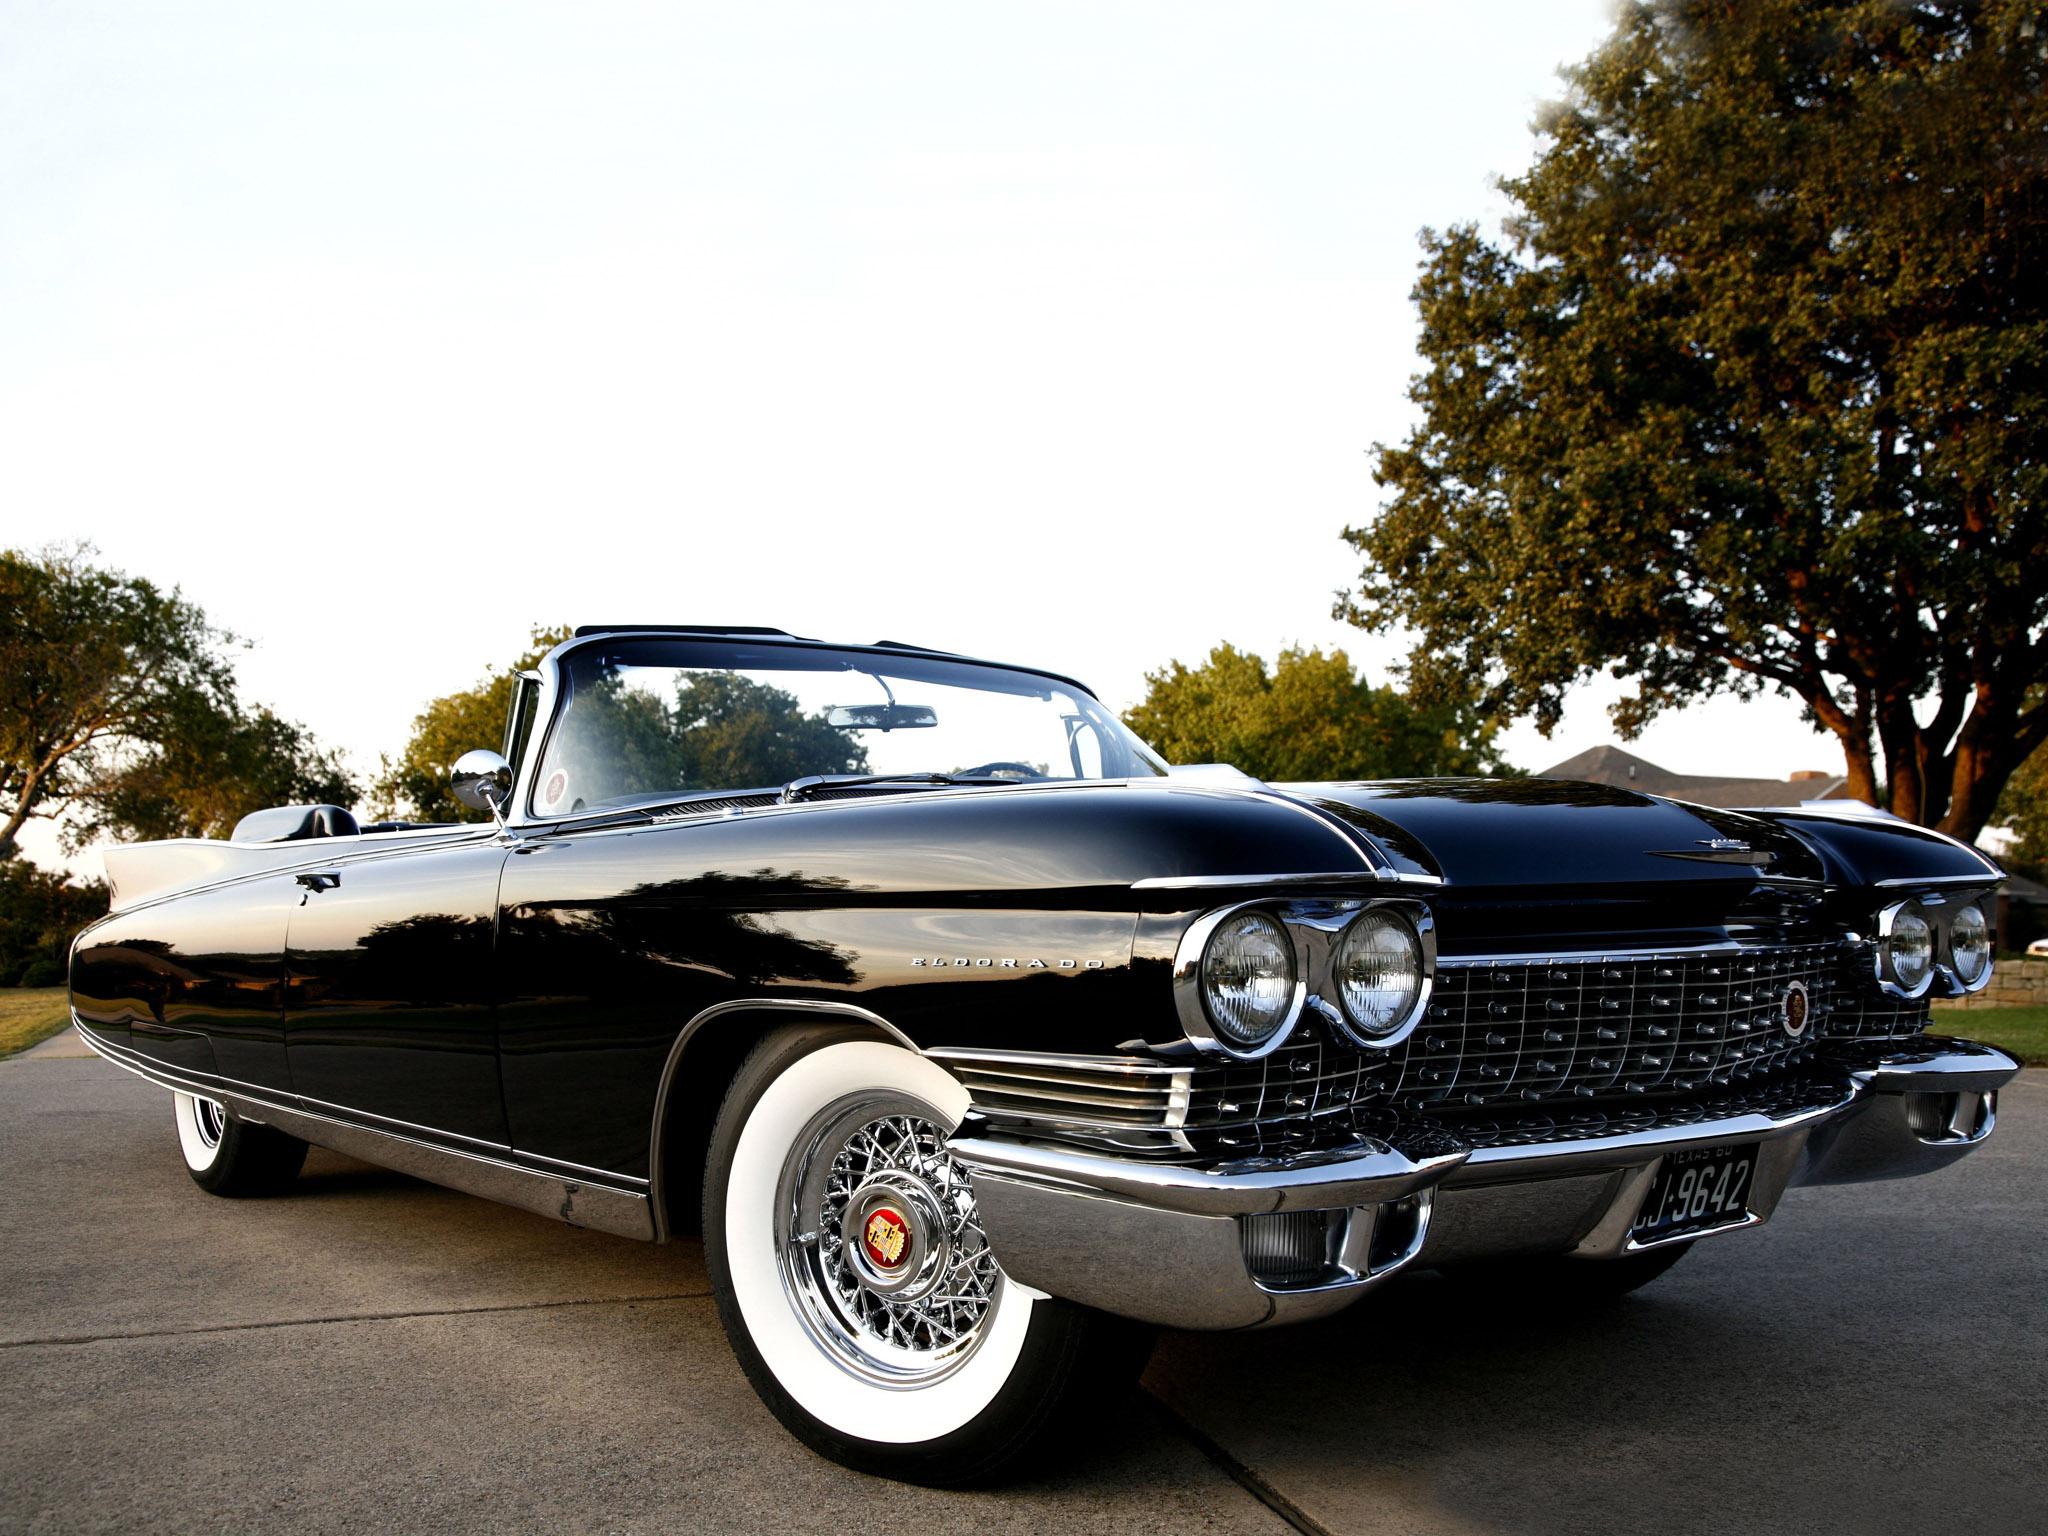 1960 cadillac eldorado biarritz classic luxury convertible - Cadillac wallpaper ...